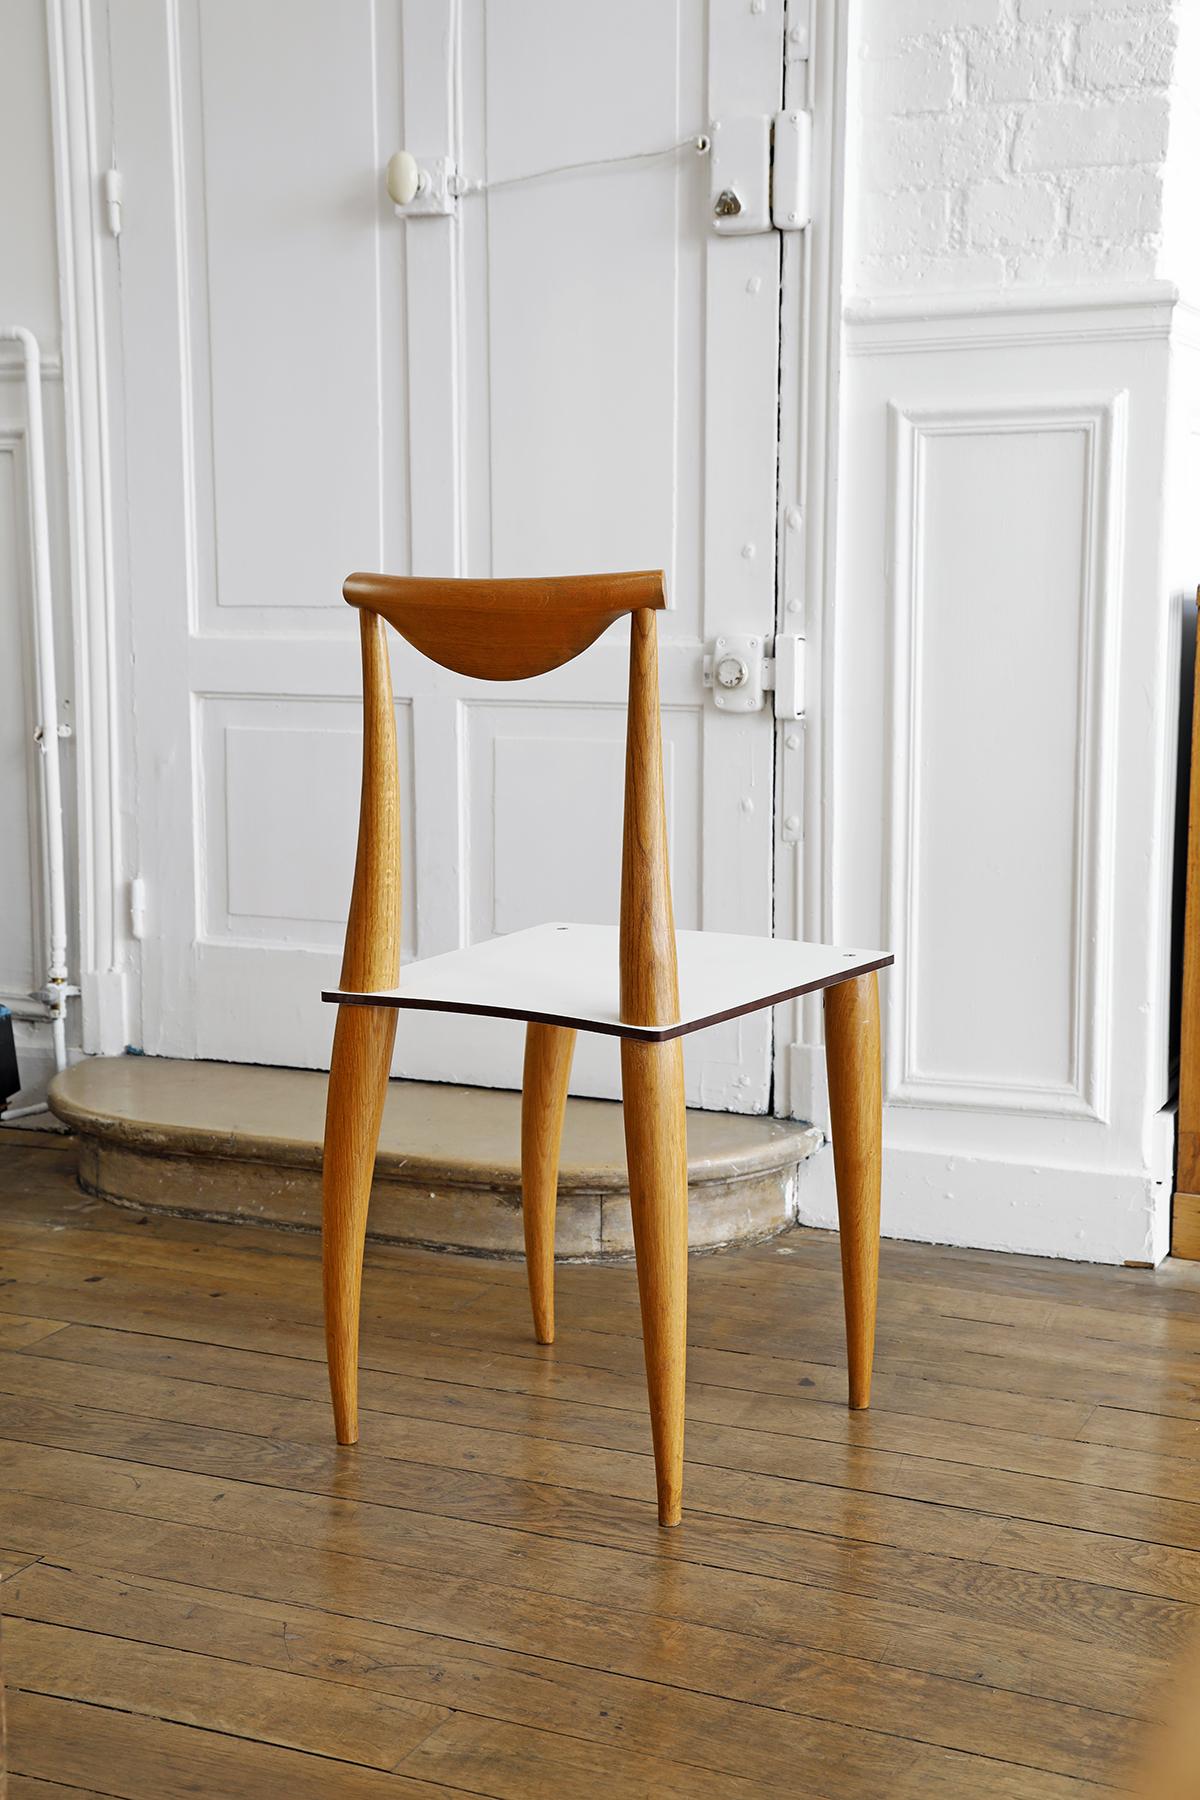 Flammarion Chaise MB Sylvain Dubuisson 02.jpg